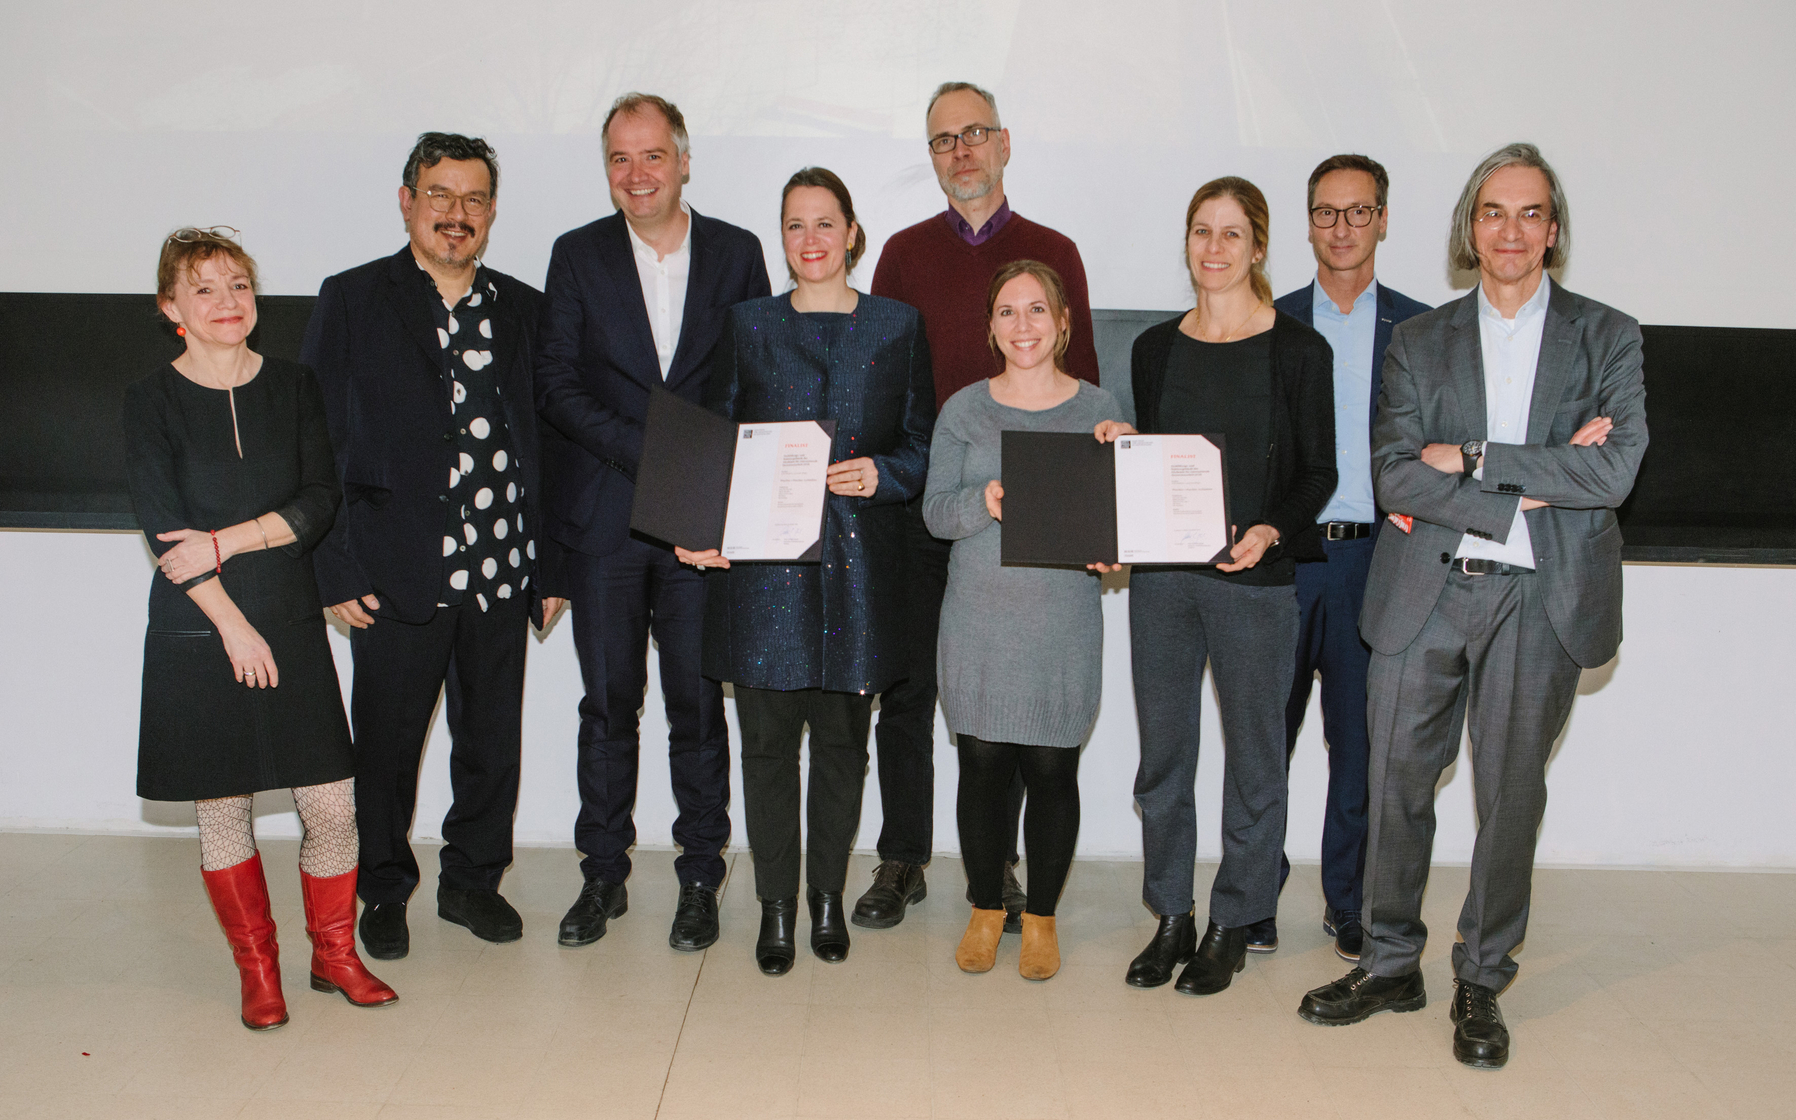 DAM Preis 2019 - Preisverleihung